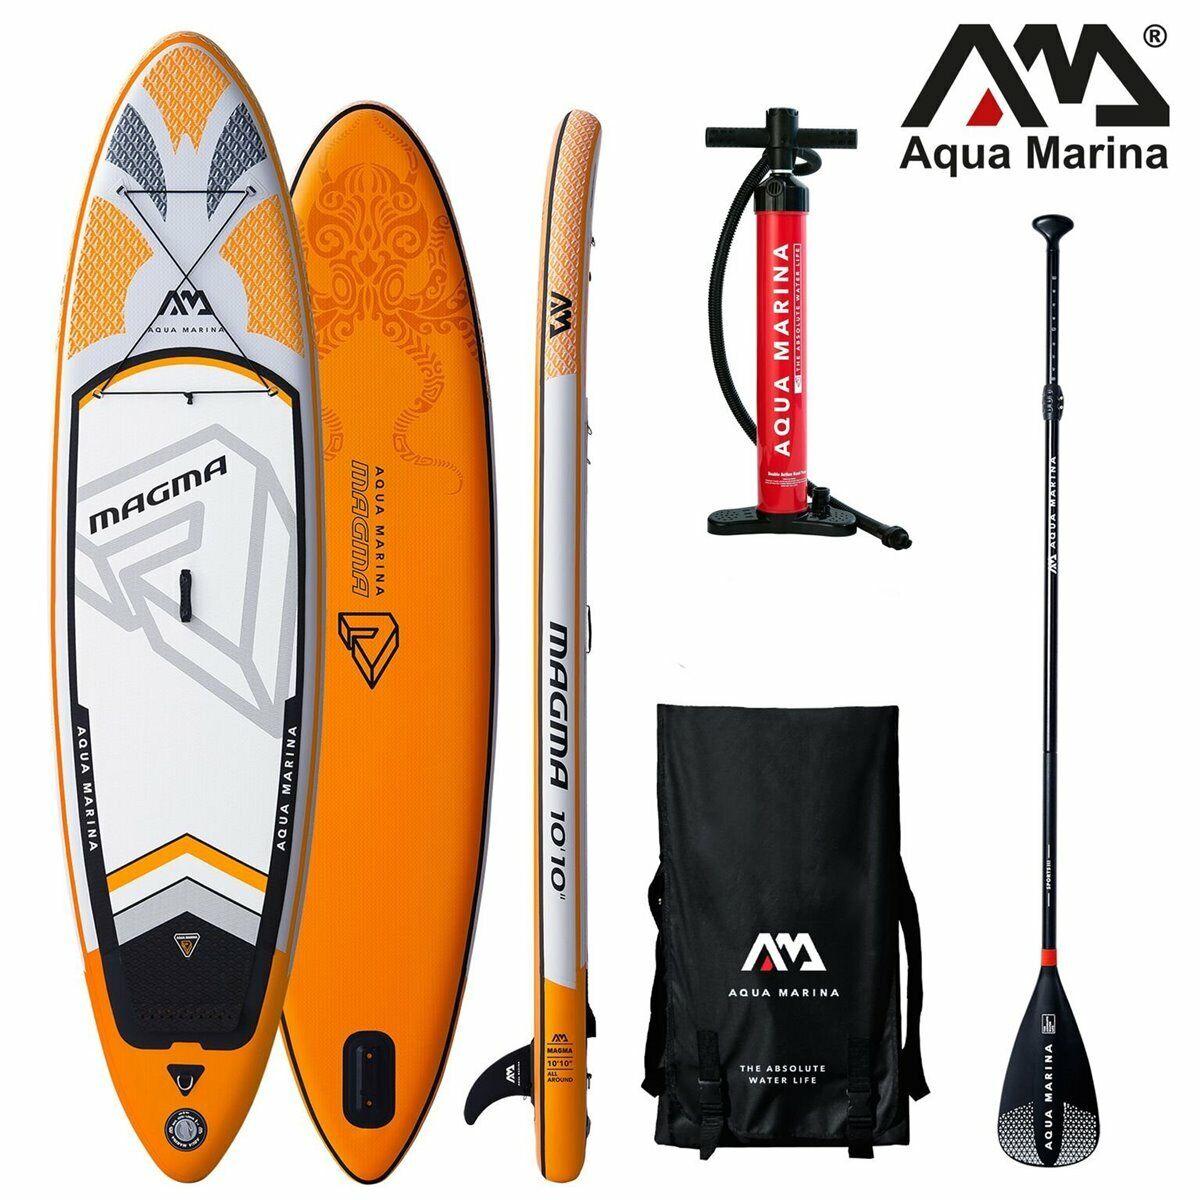 Aqua Marina Magma Stand Up Paddle Tabla Sup Tablero de Paddel Isup Sport Remos